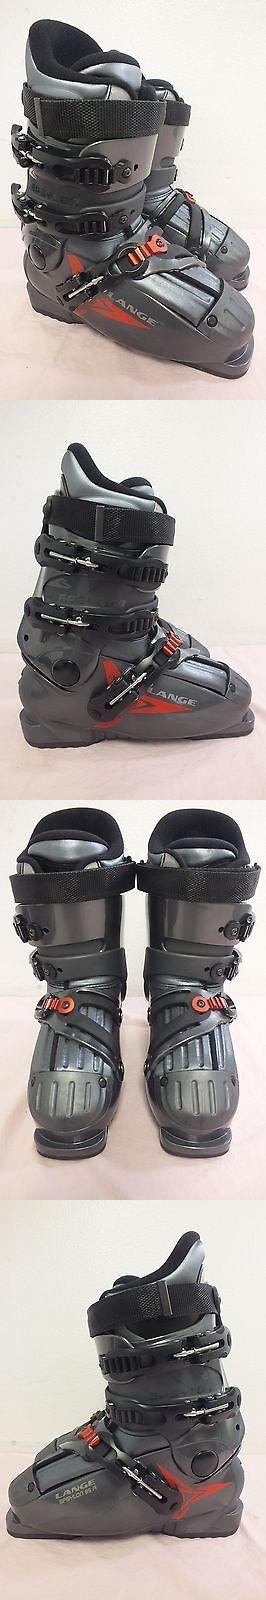 Women 21241: Lange Epsylon 85 R Womens Downhill Ski Boots Mondopoint 24.5 Us 8.5 New Look -> BUY IT NOW ONLY: $59.95 on eBay!